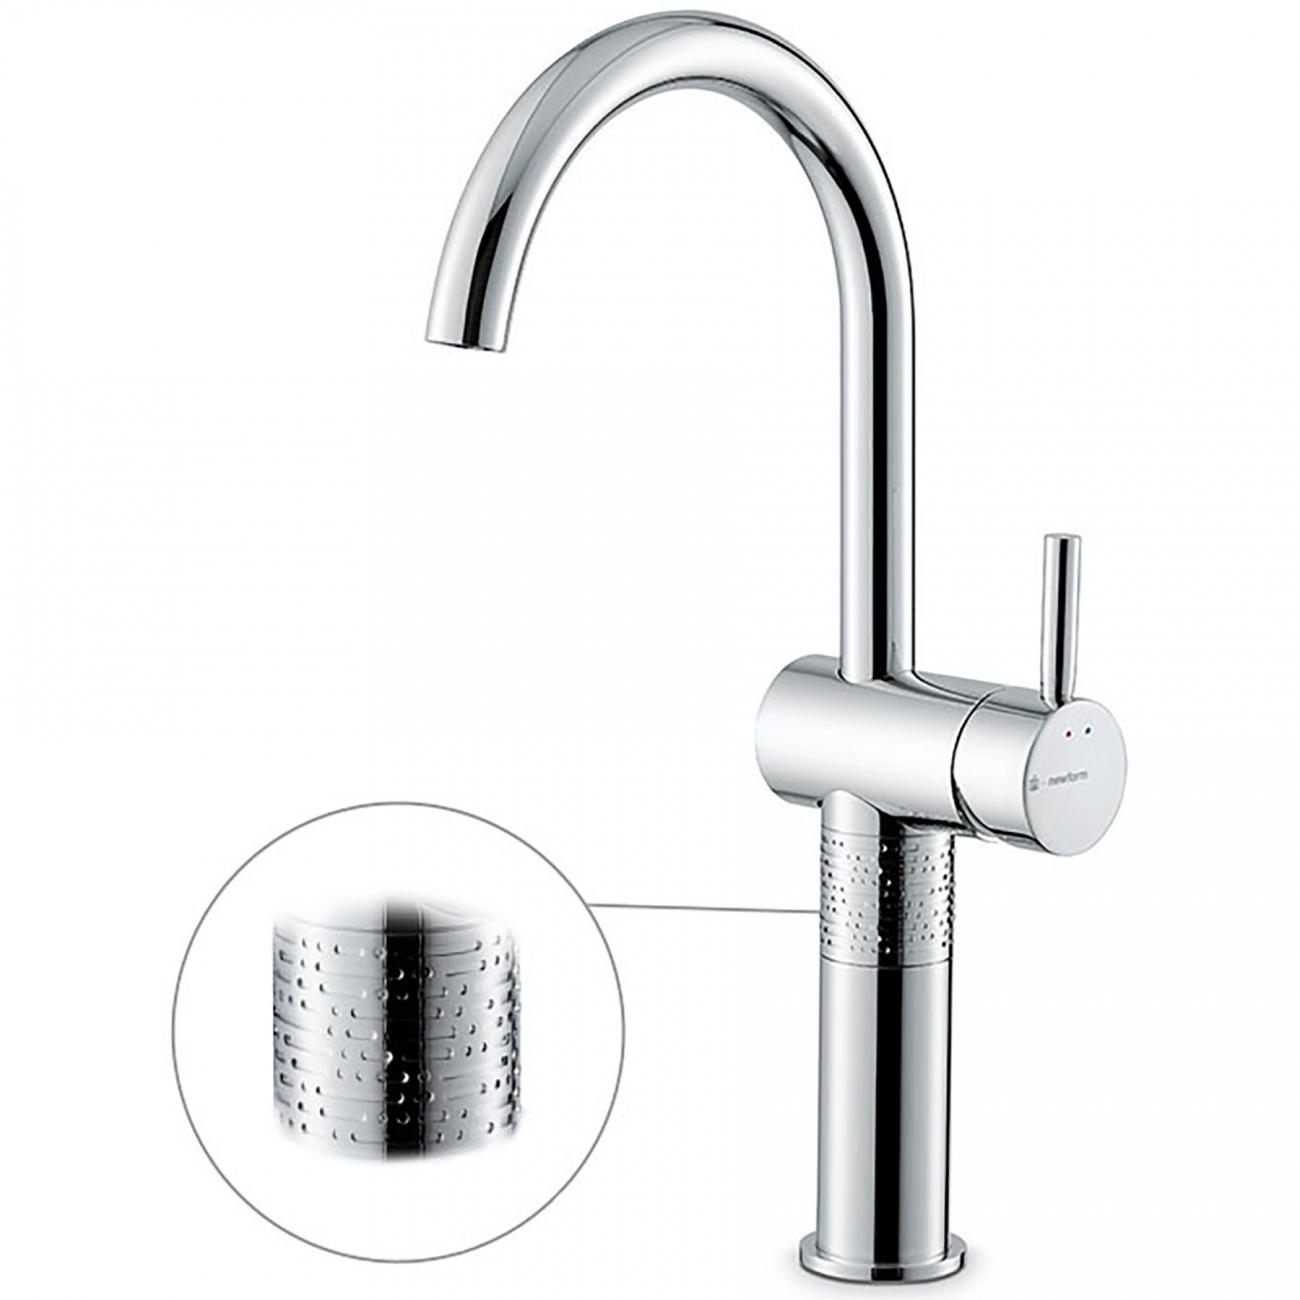 Newform Blink Luxury high basin mixer